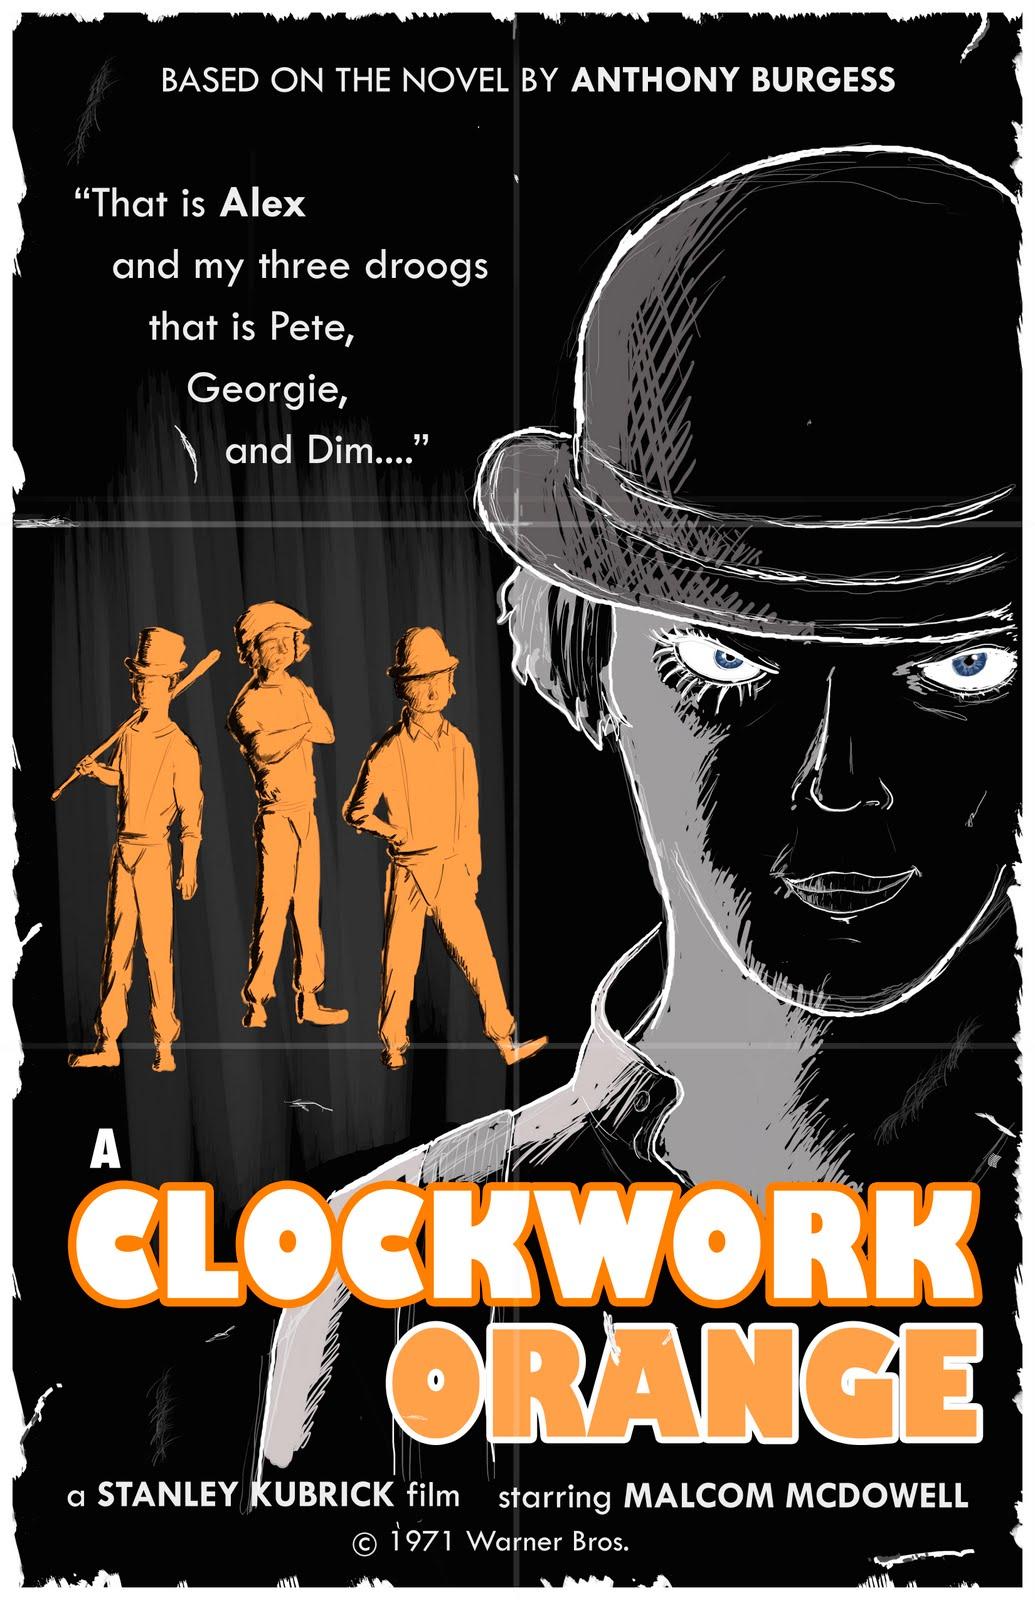 Jeff Walpole's Artwork: A Clockwork Orange Movie Poster